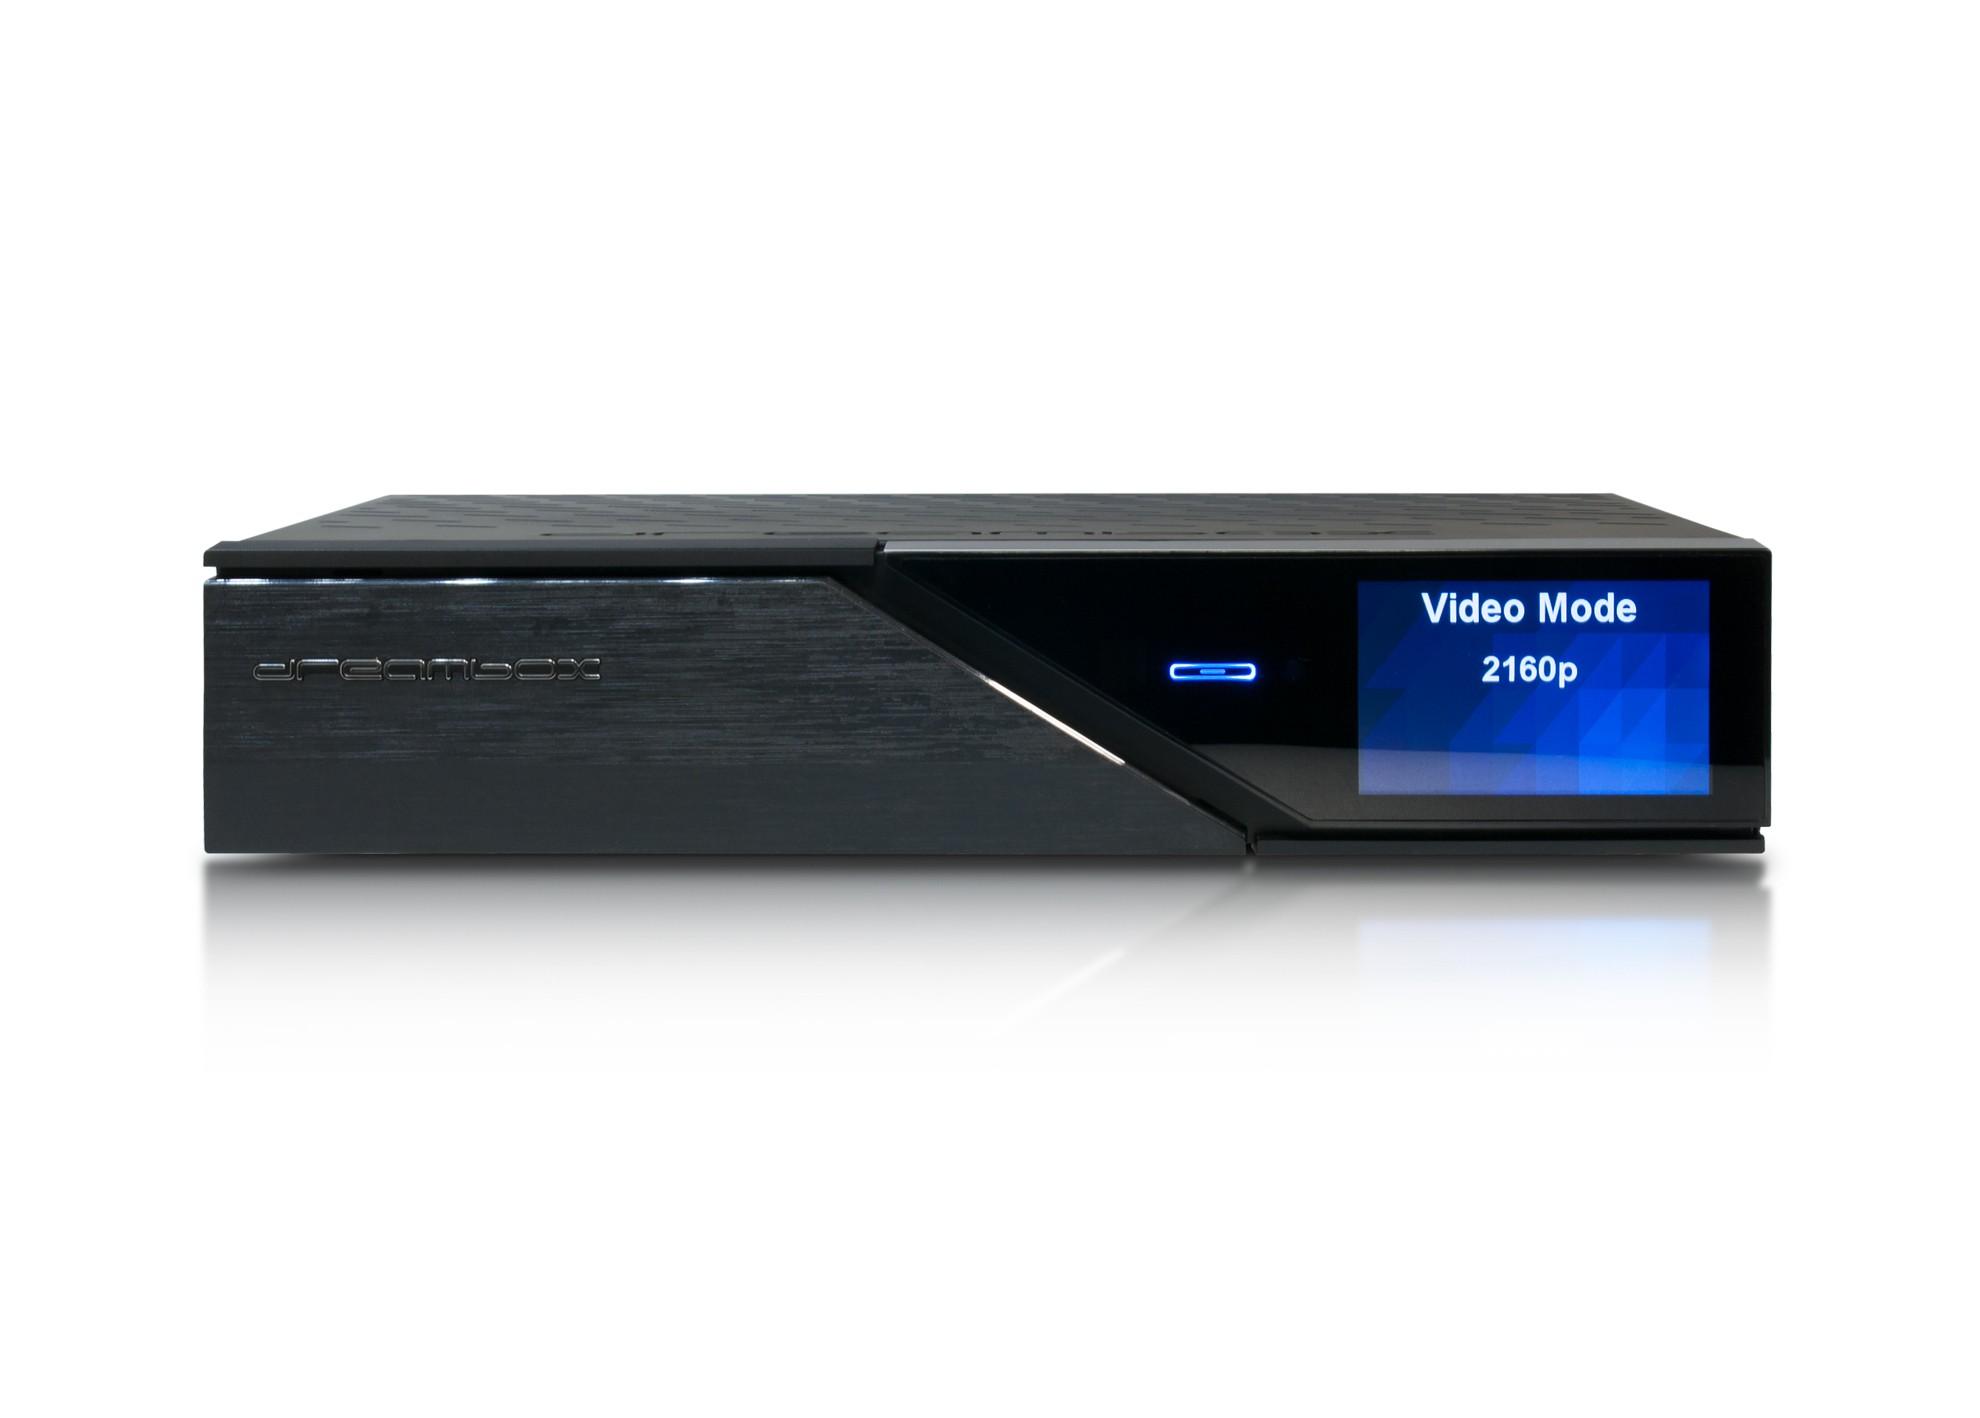 Dreambox DM-900 RC20 UHD 4K (1x Dual DVB-S2X)